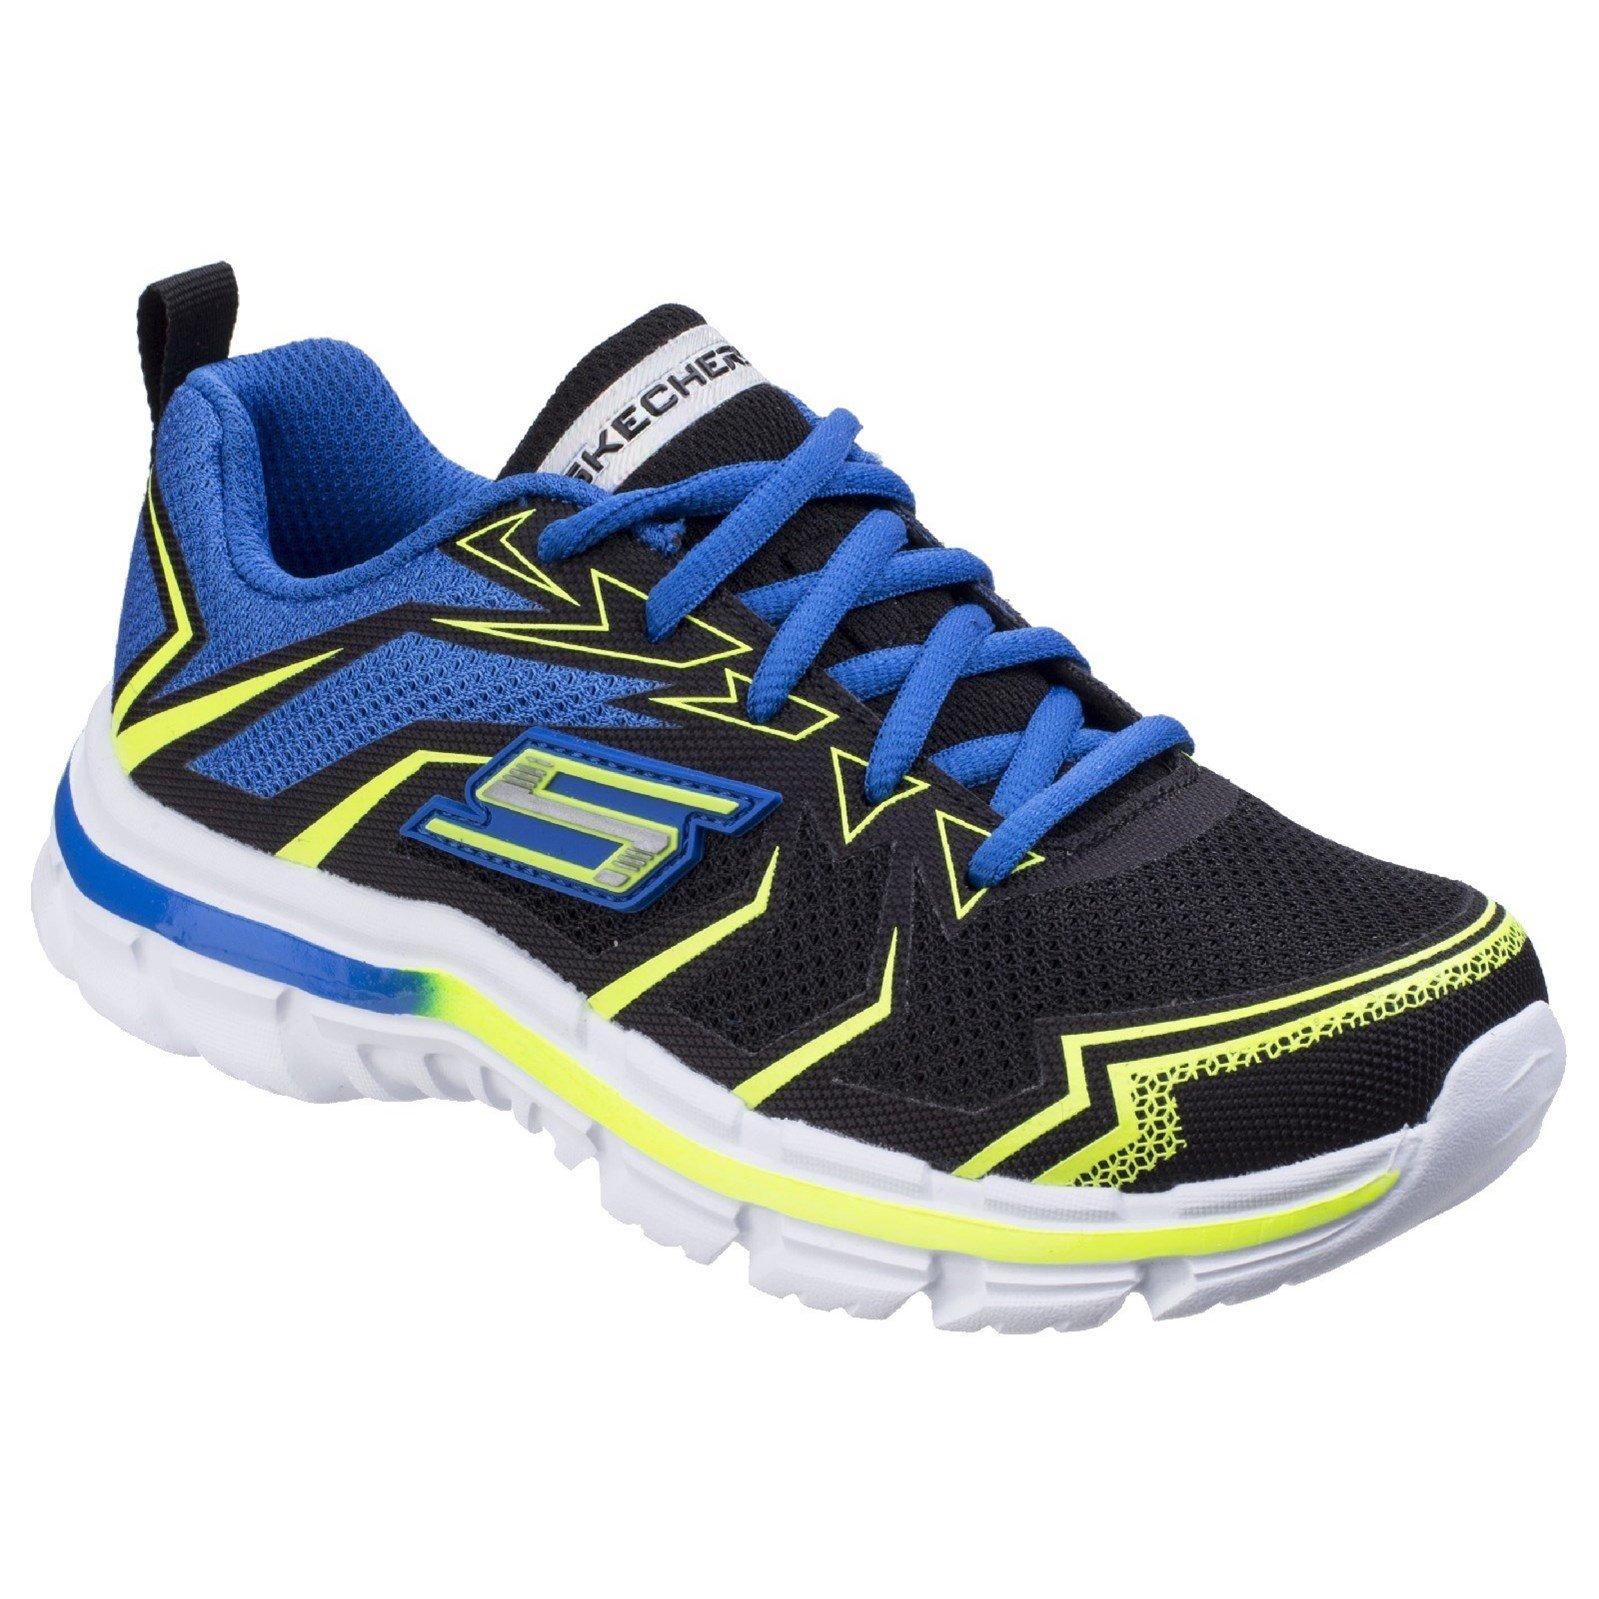 Skechers Childrens Boys SK95356L Nitrate Ultra Blast Sports Shoes/Trainers (13.5 US Junior, Black Blue)